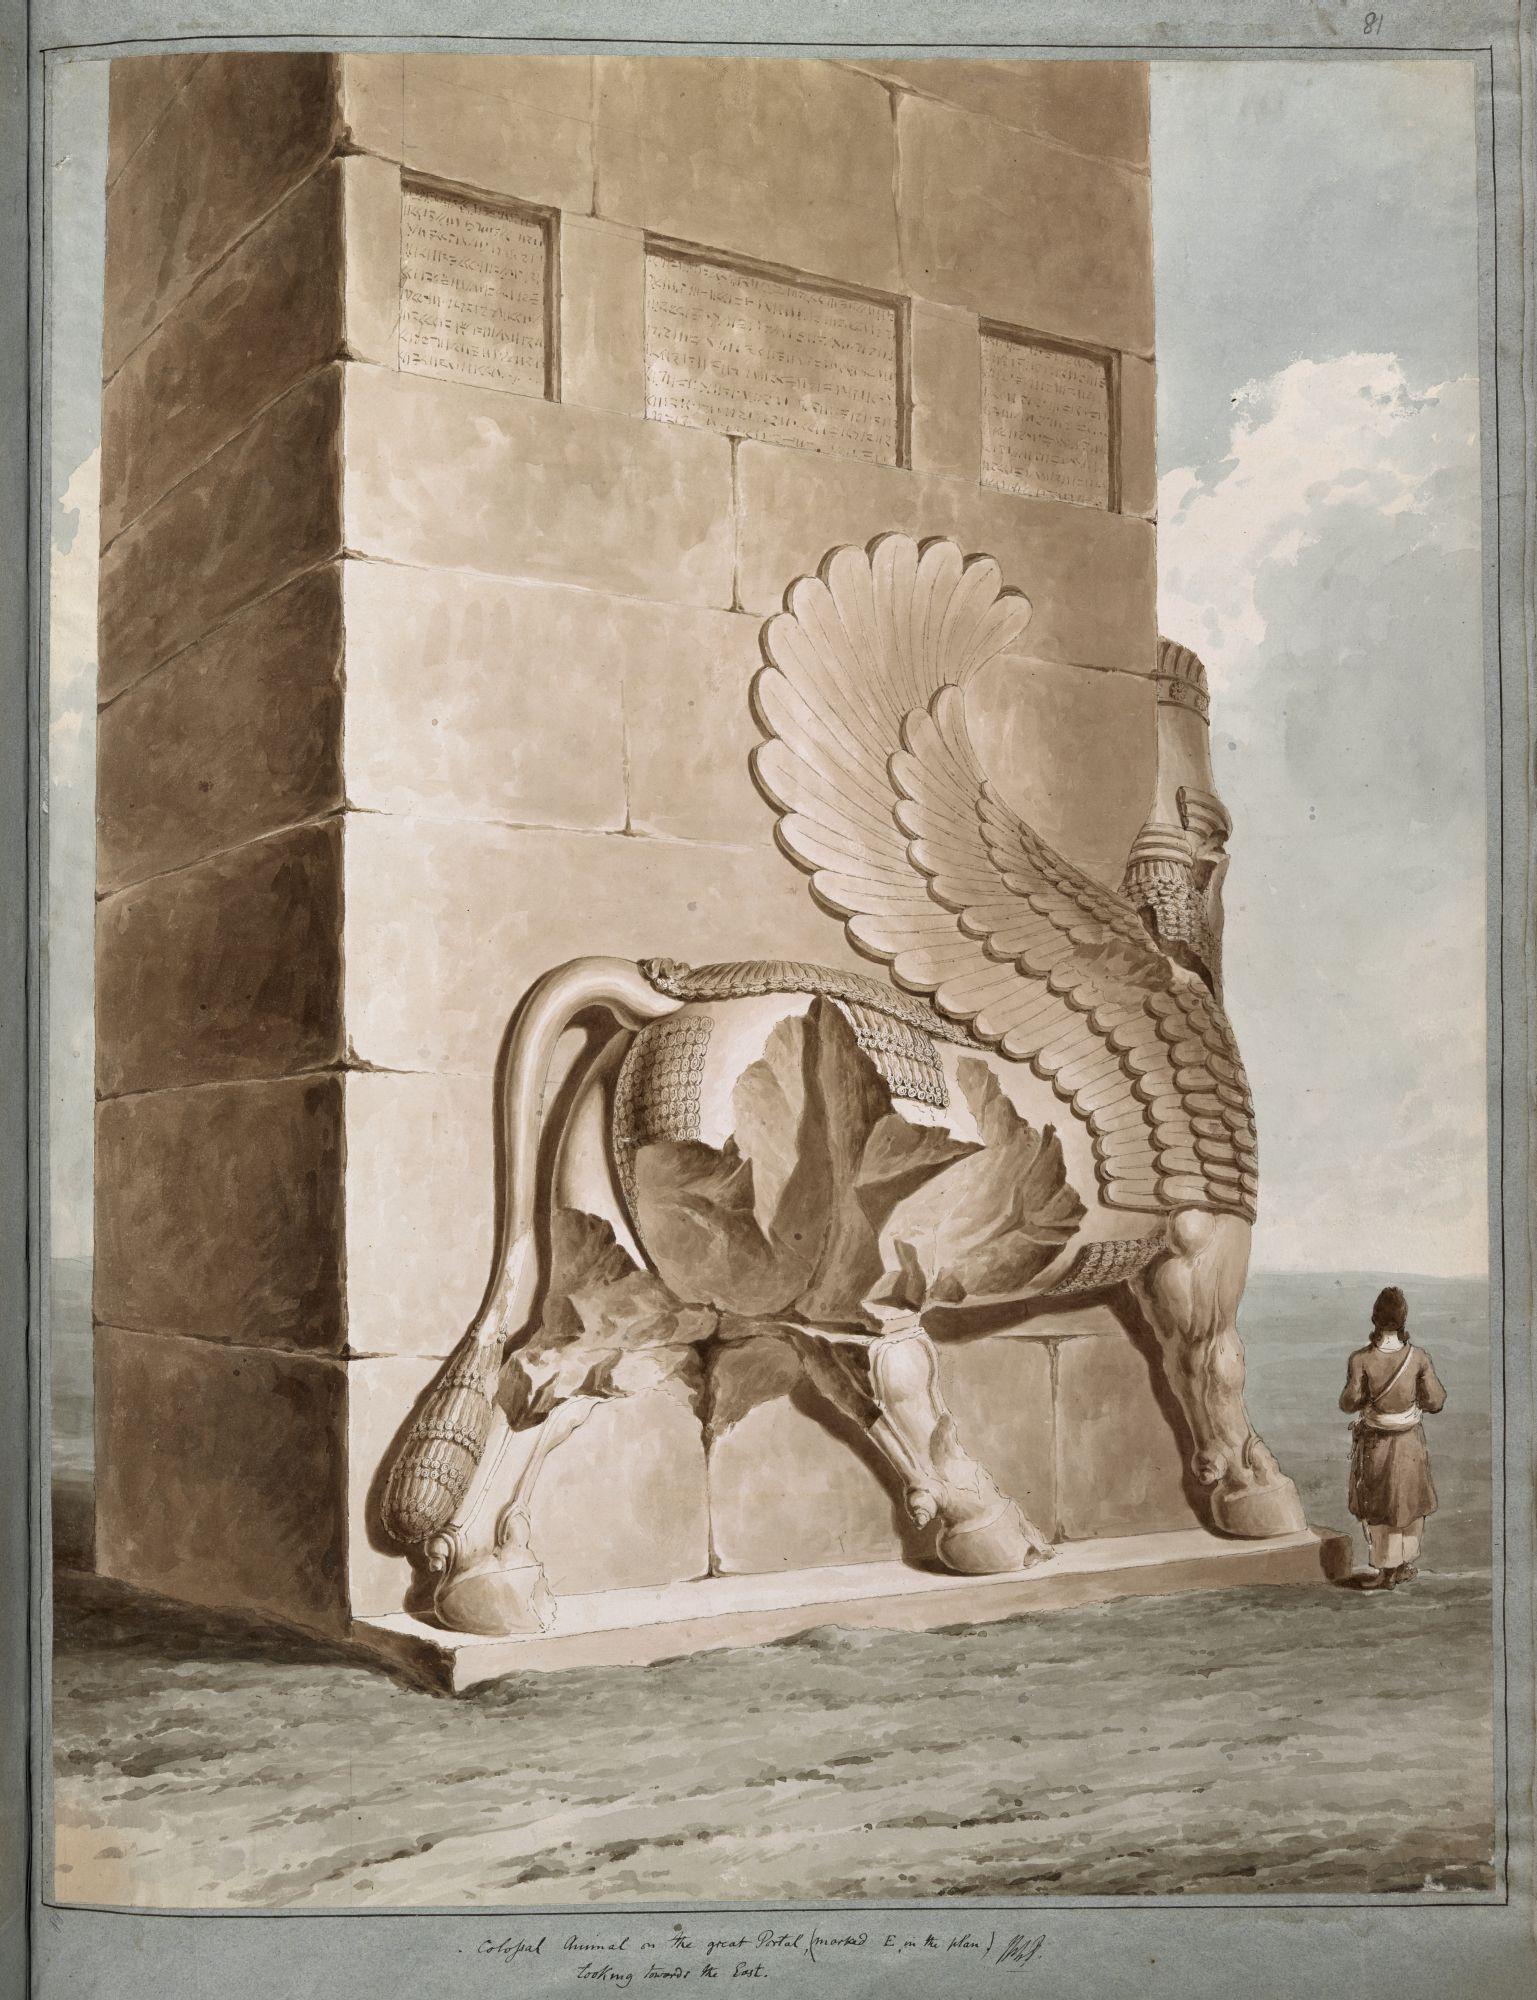 A winged bull at Persepolis, by Sir Robert Ker Porter.